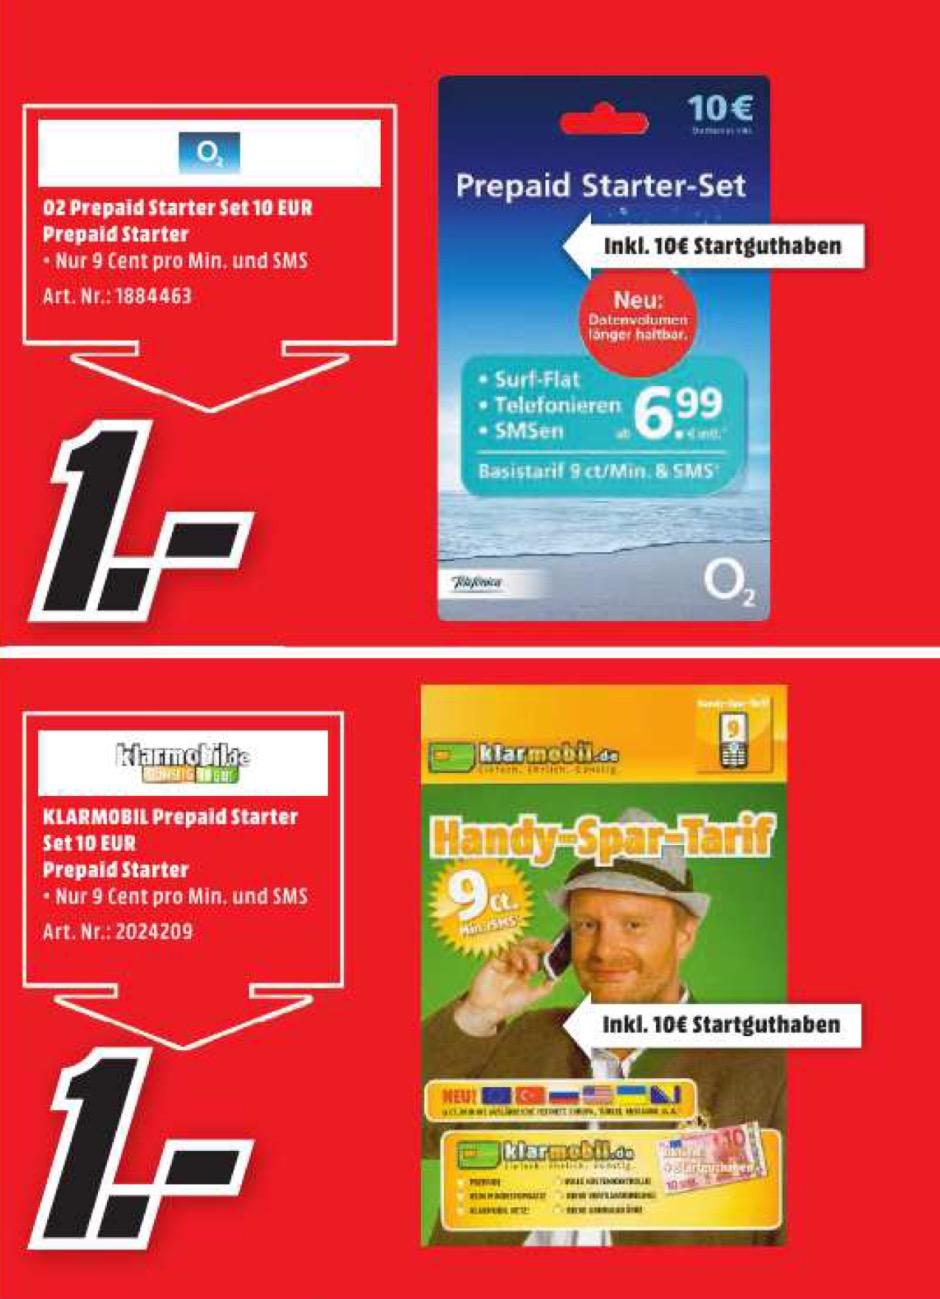 lokal MM Kaiserslautern - o2 / klarmobil Prepaid StarterSet inkl. 10€ Guthaben für je 1€